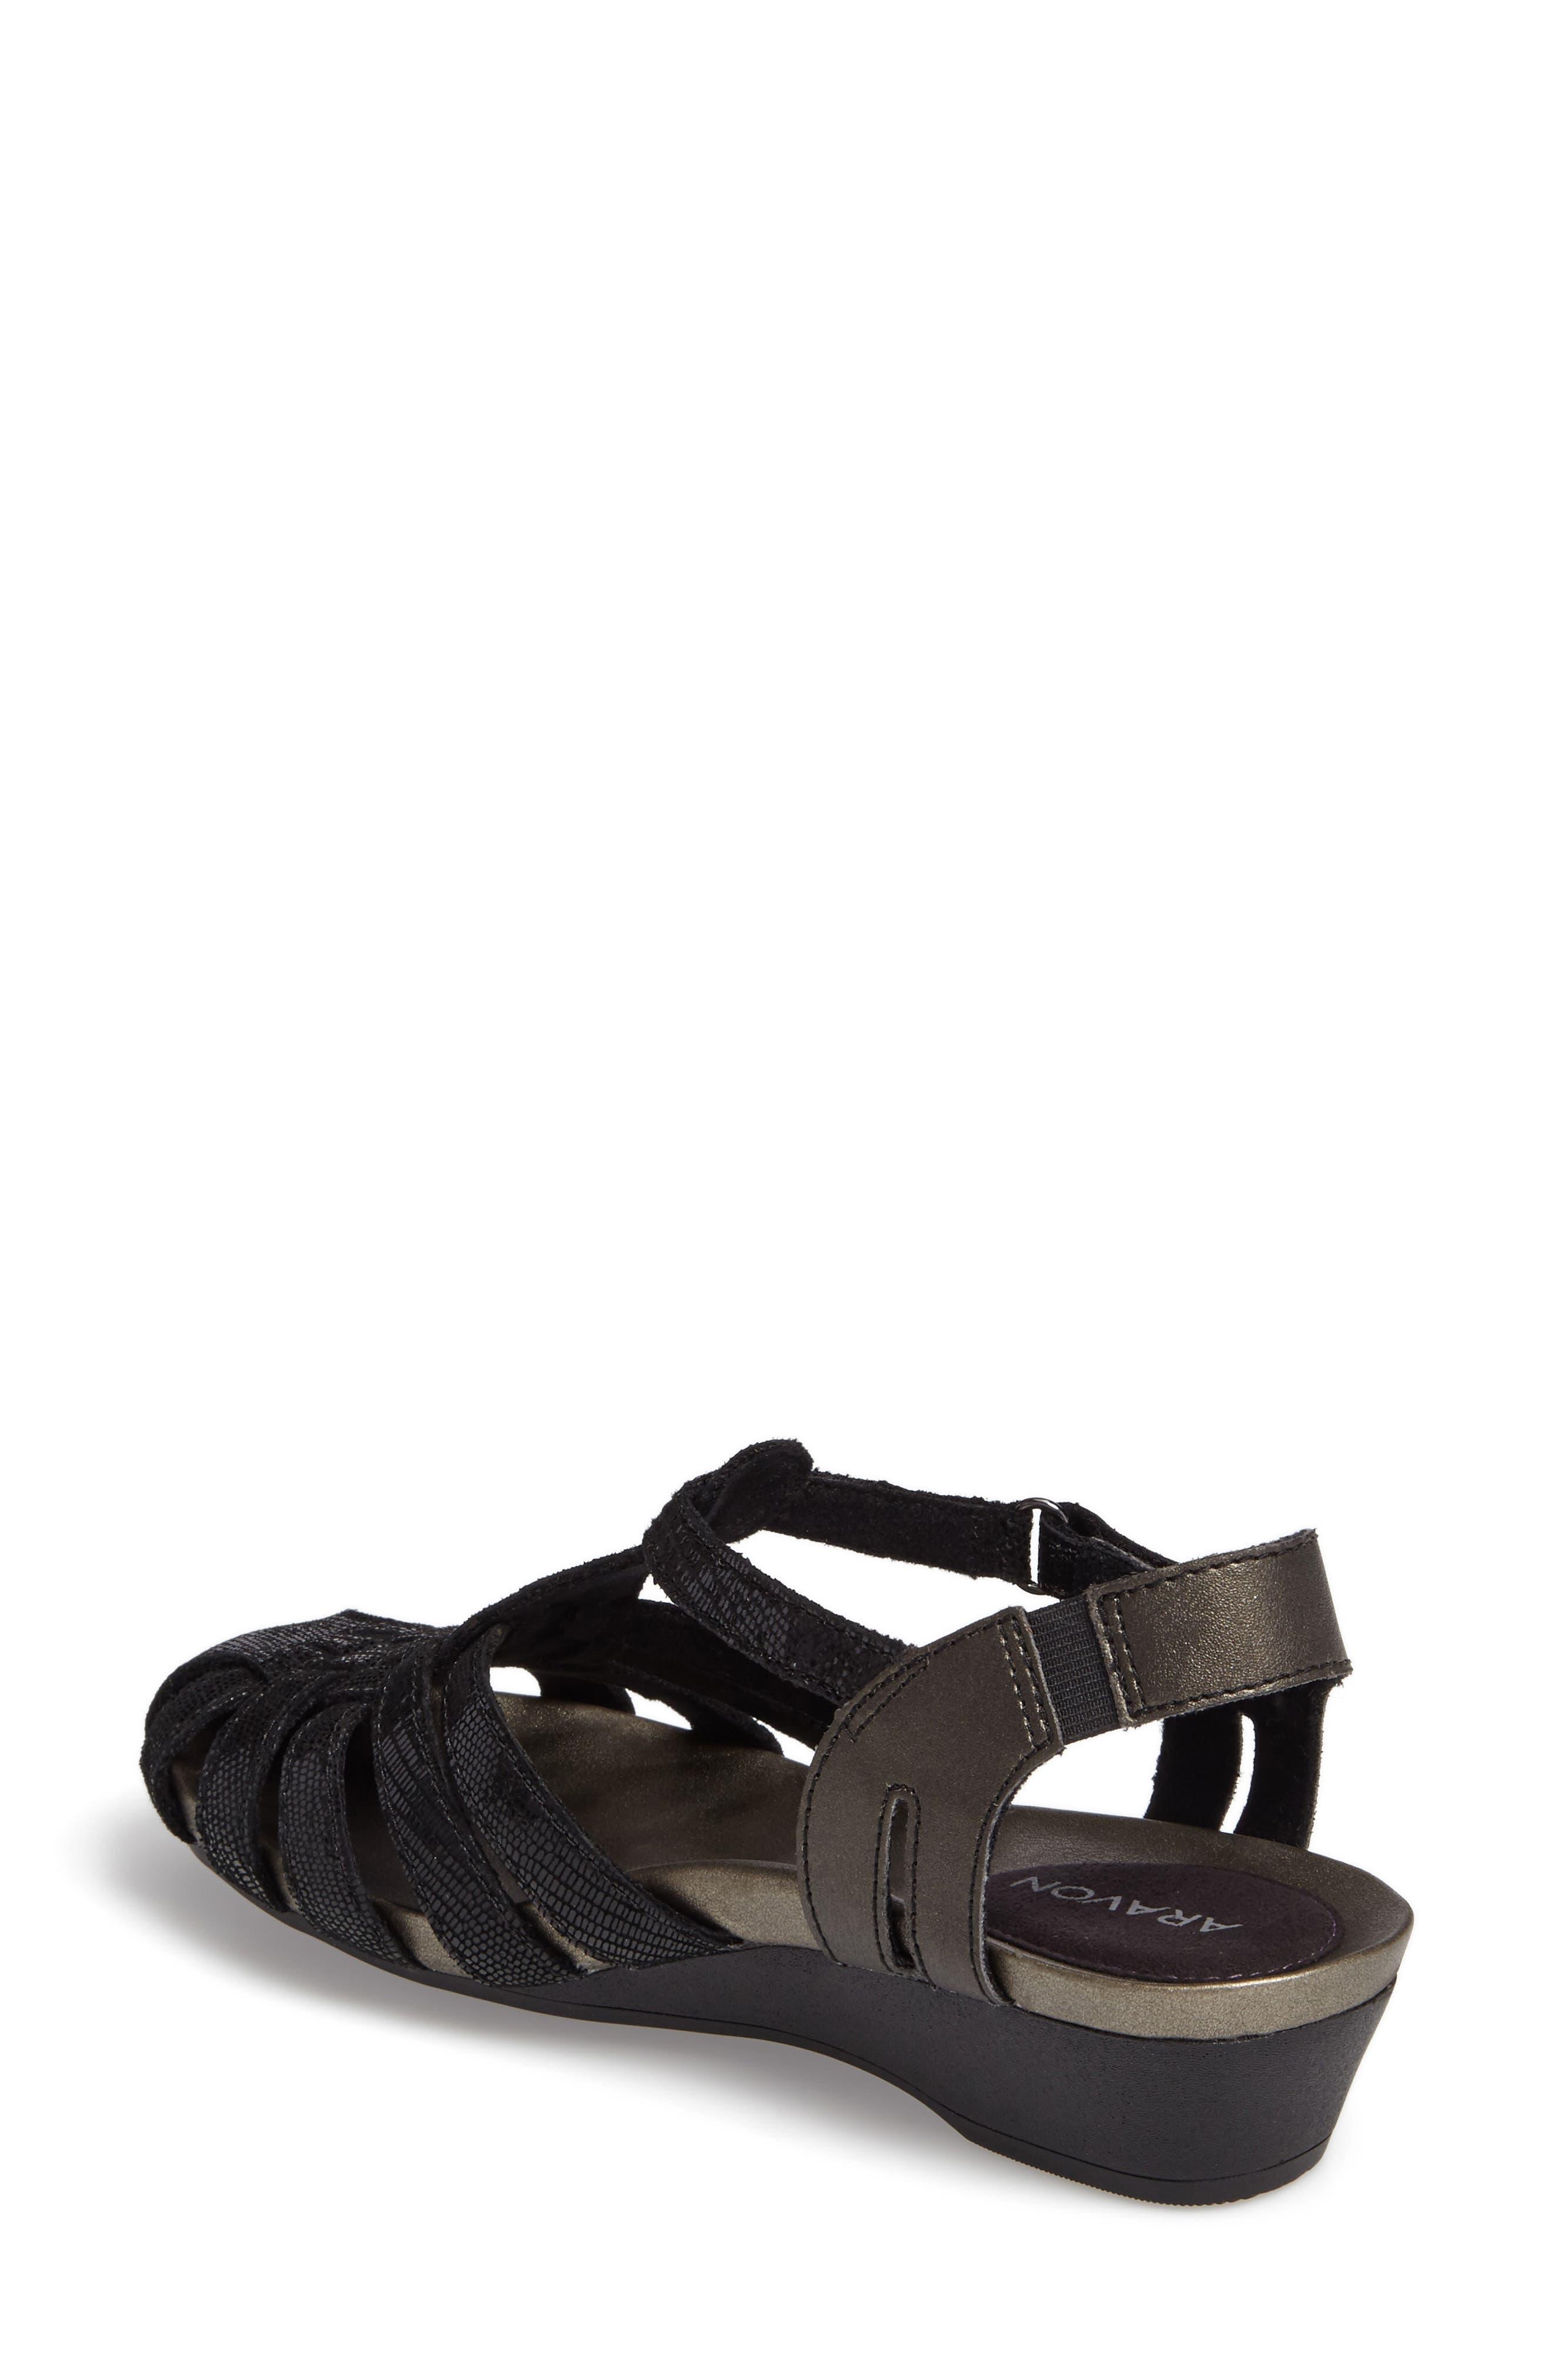 Standon Wedge Sandal,                             Alternate thumbnail 2, color,                             BLACK FABRIC